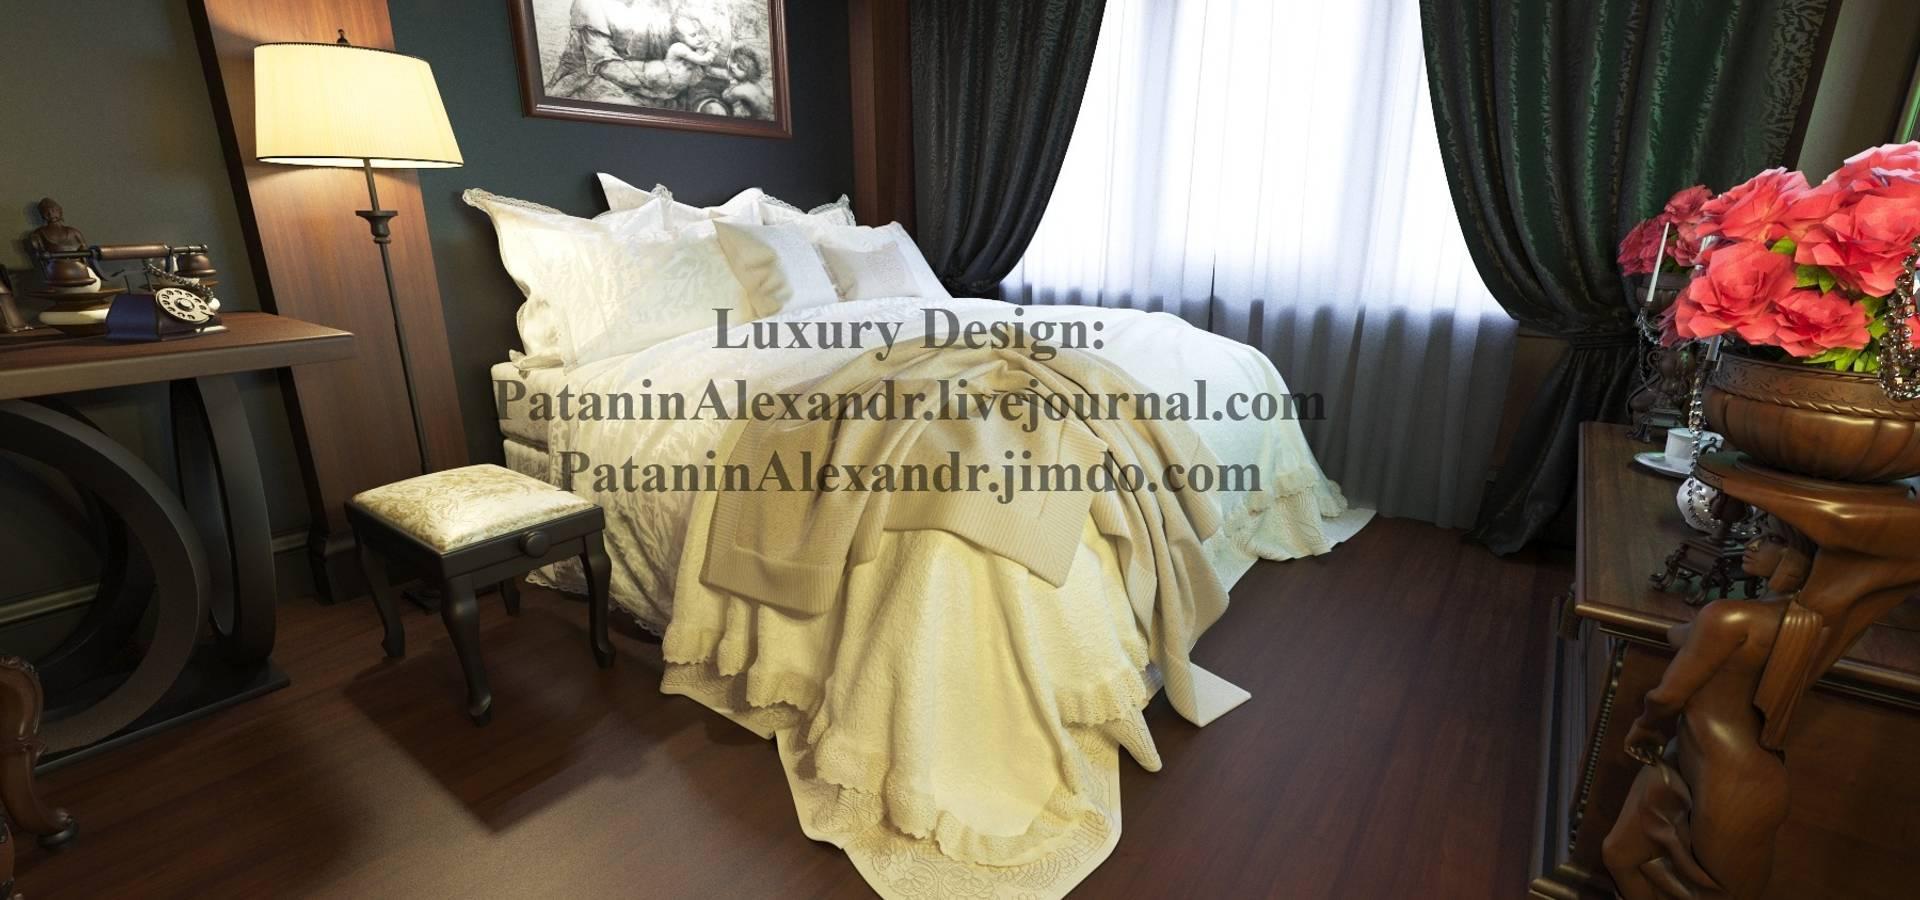 Patanin Luxury Design